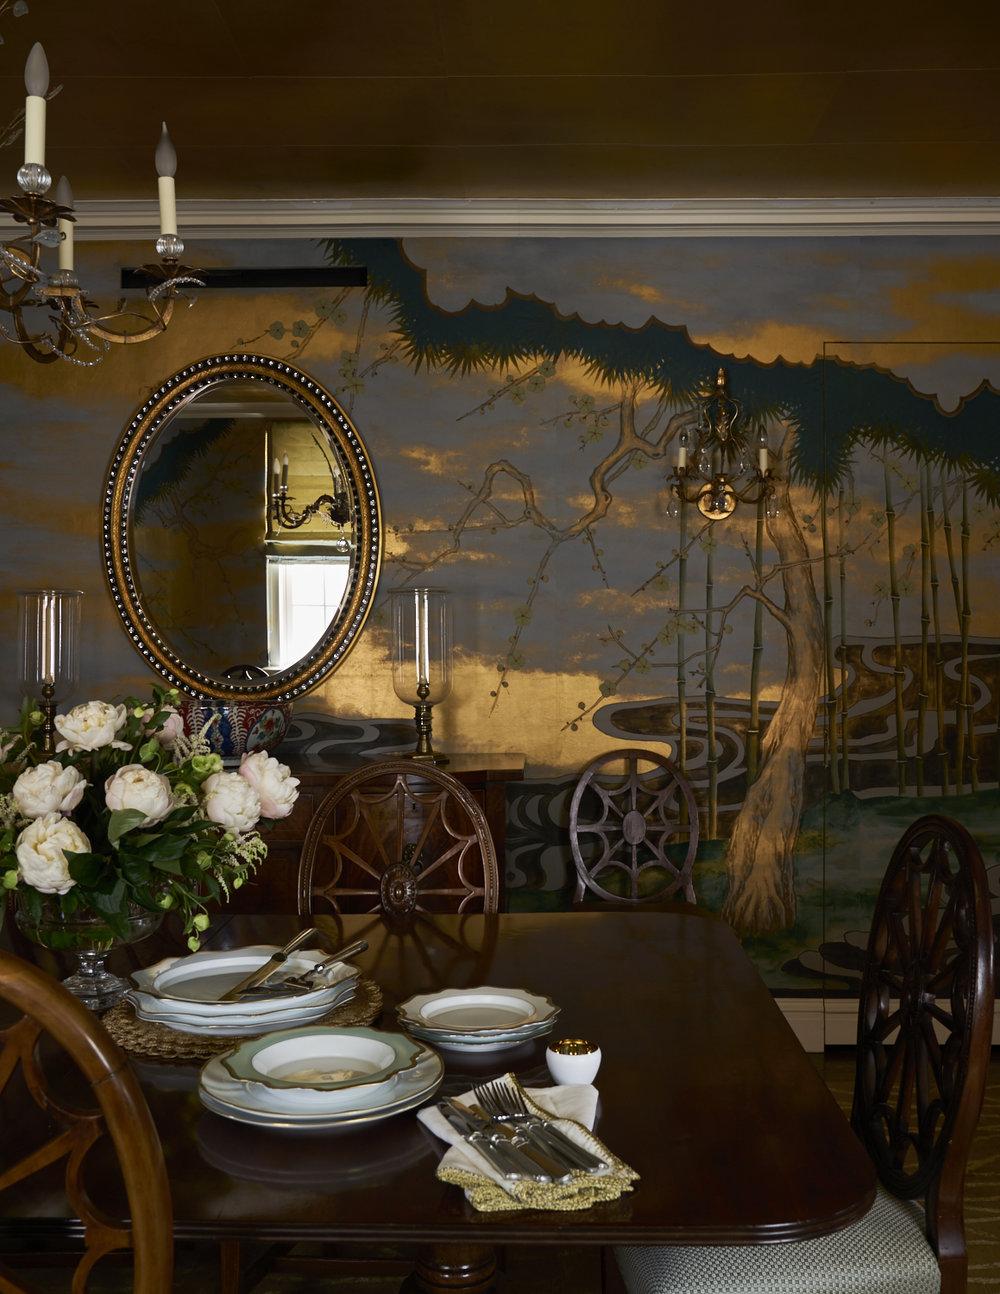 10 Dining Room 2 HB_Katie_Lydon_Rubin_Residence_020 copy.jpg